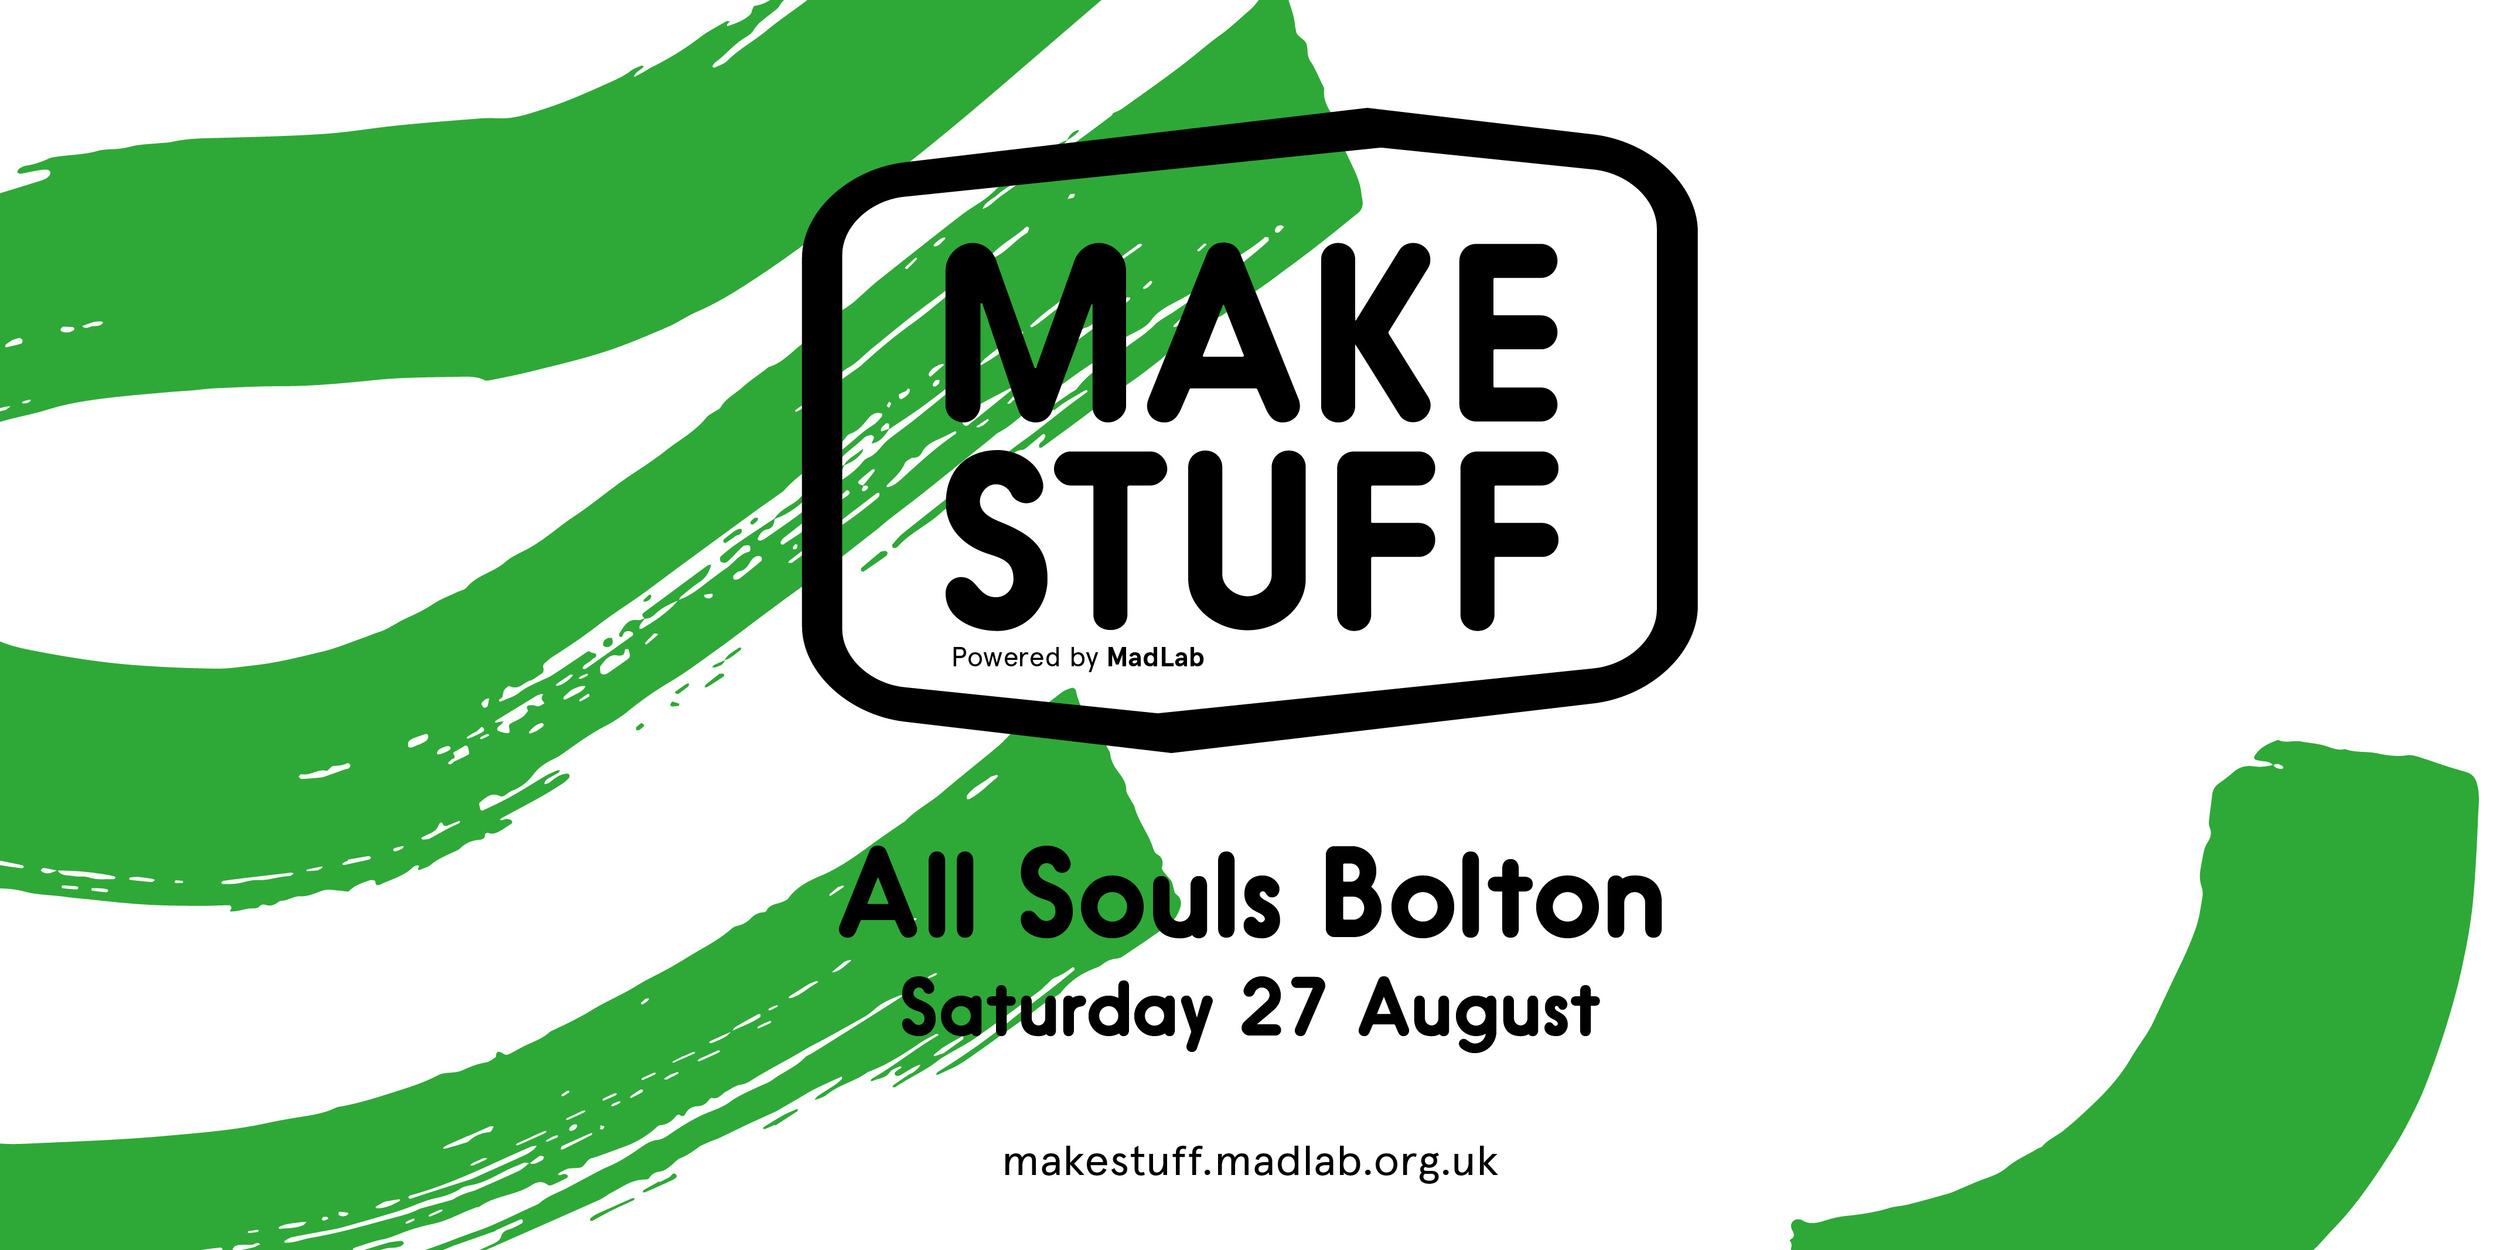 MAKE STUFF web banner2.jpg